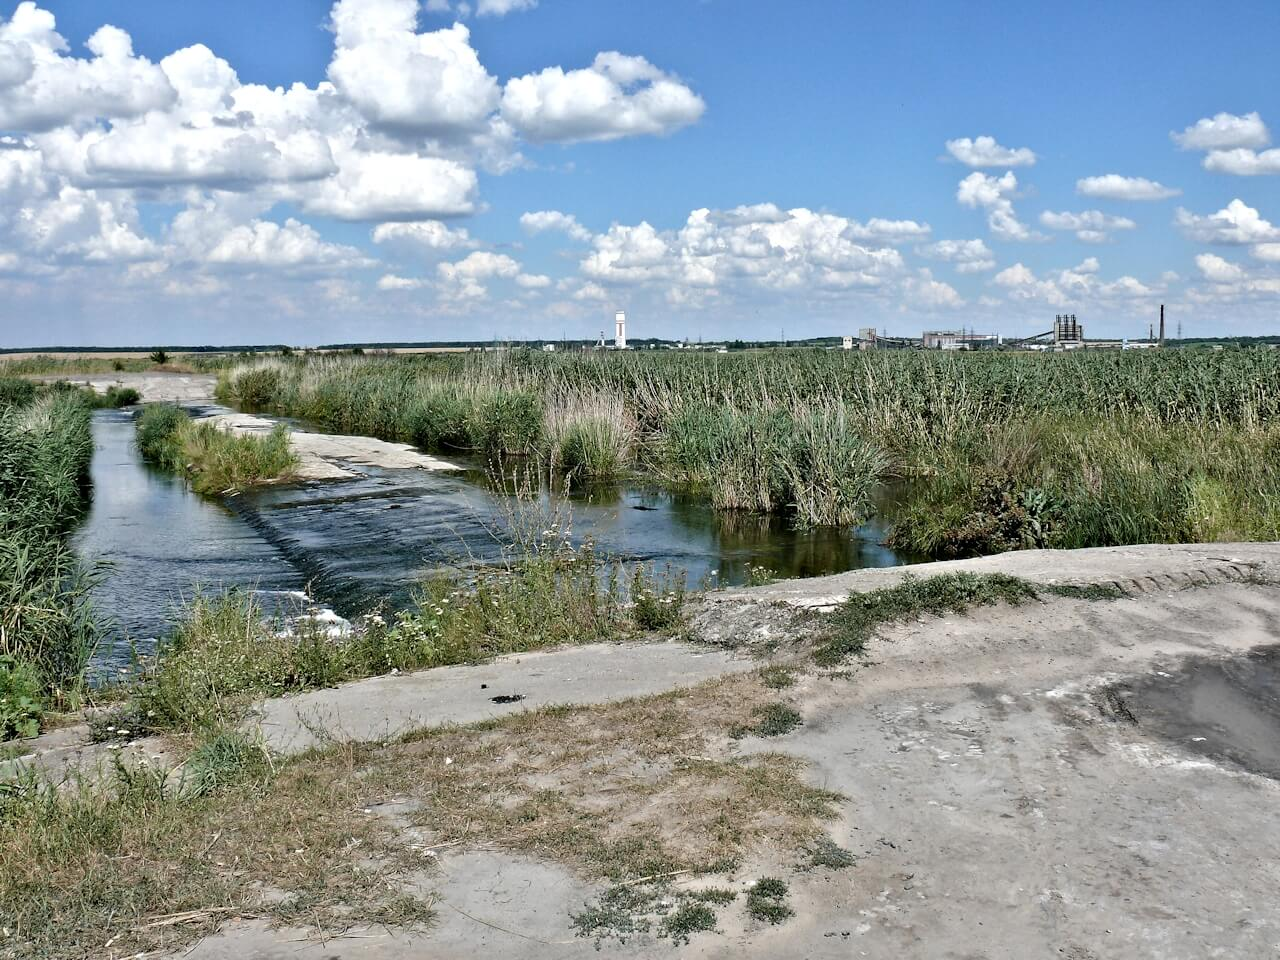 Гидросооружение на реке Самара